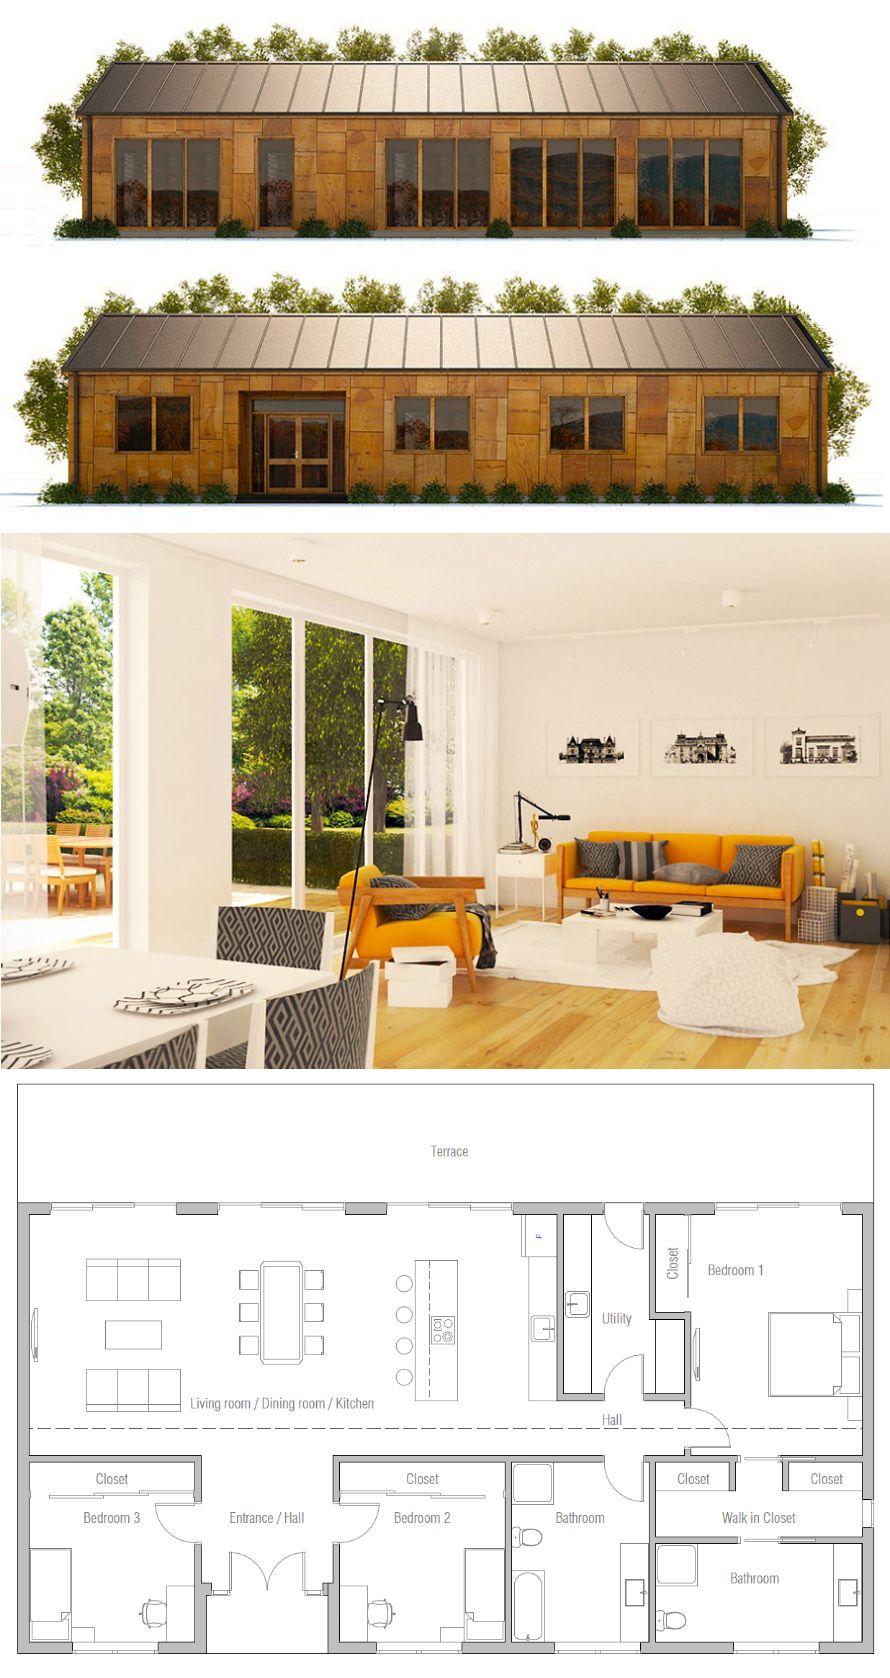 BEAST Metal Building: Barndominium Floor Plans and Design Ideas for ...